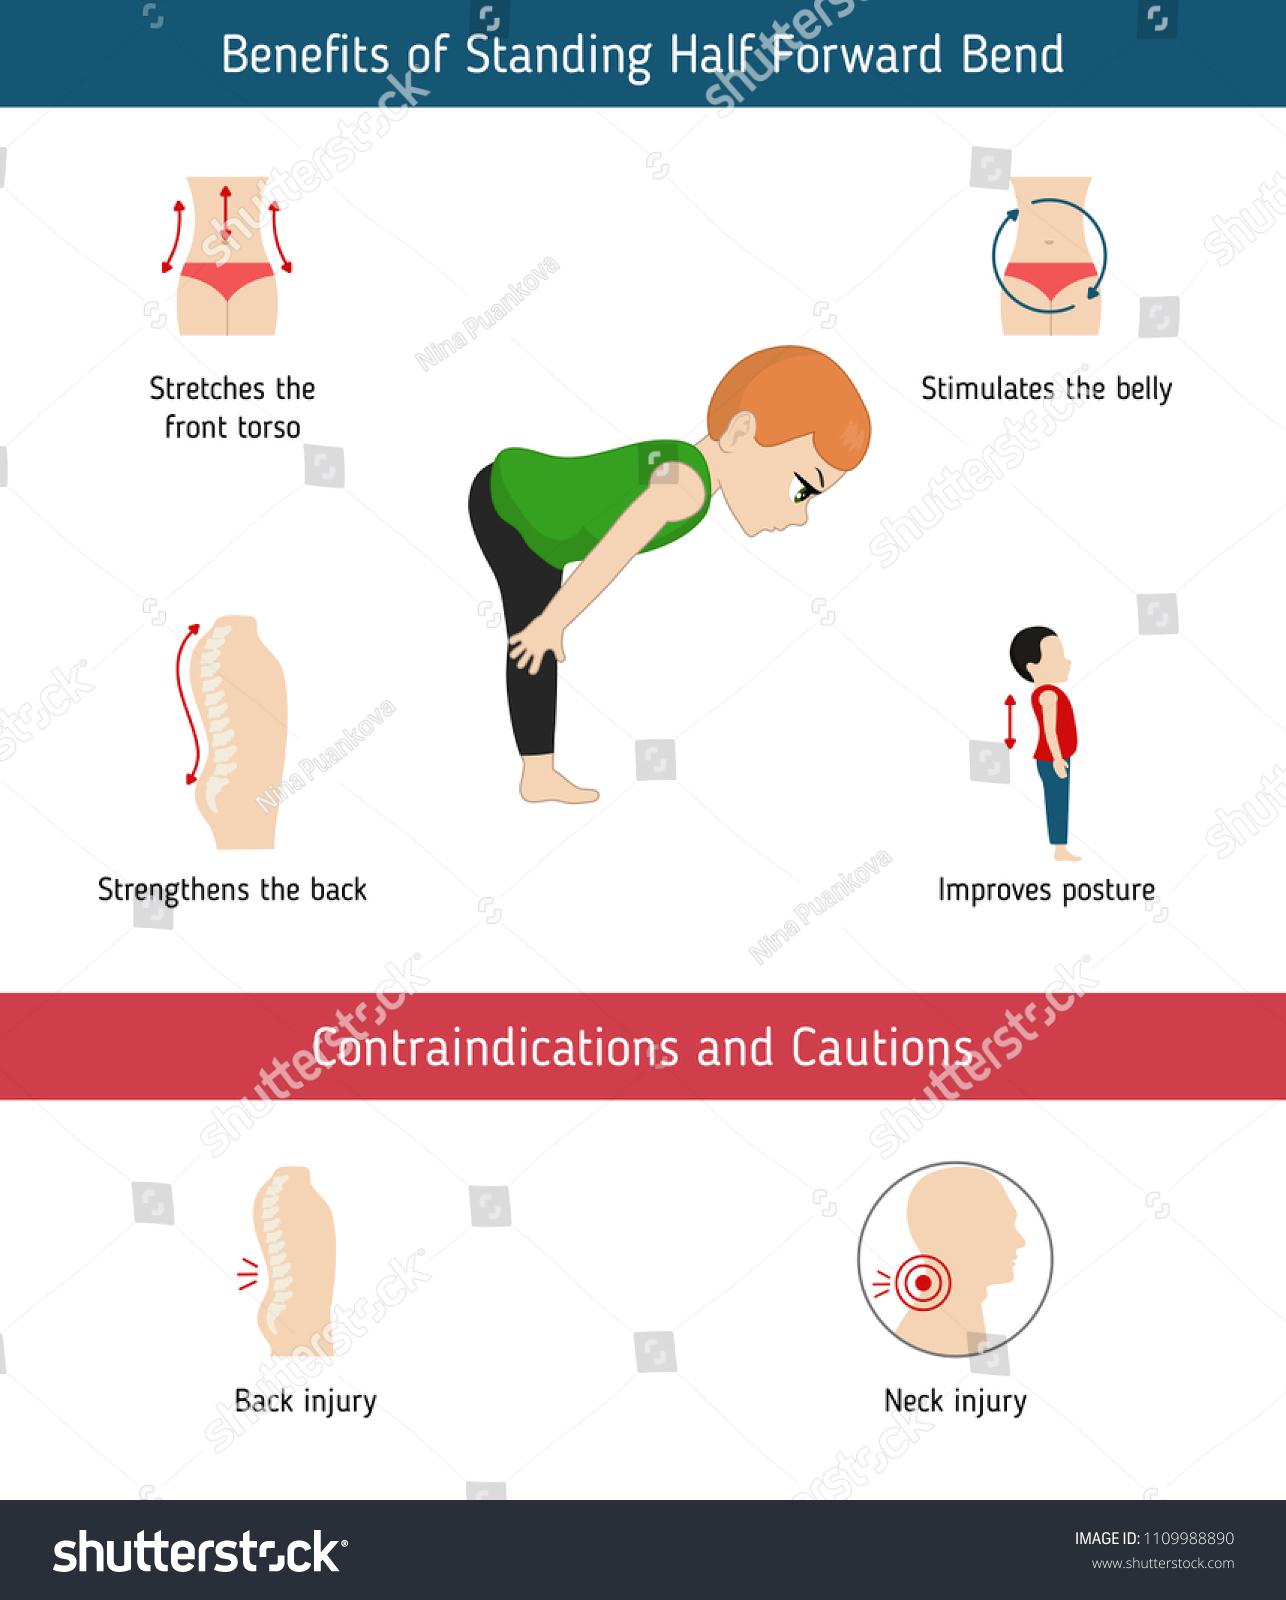 Running: benefits and contraindications 59